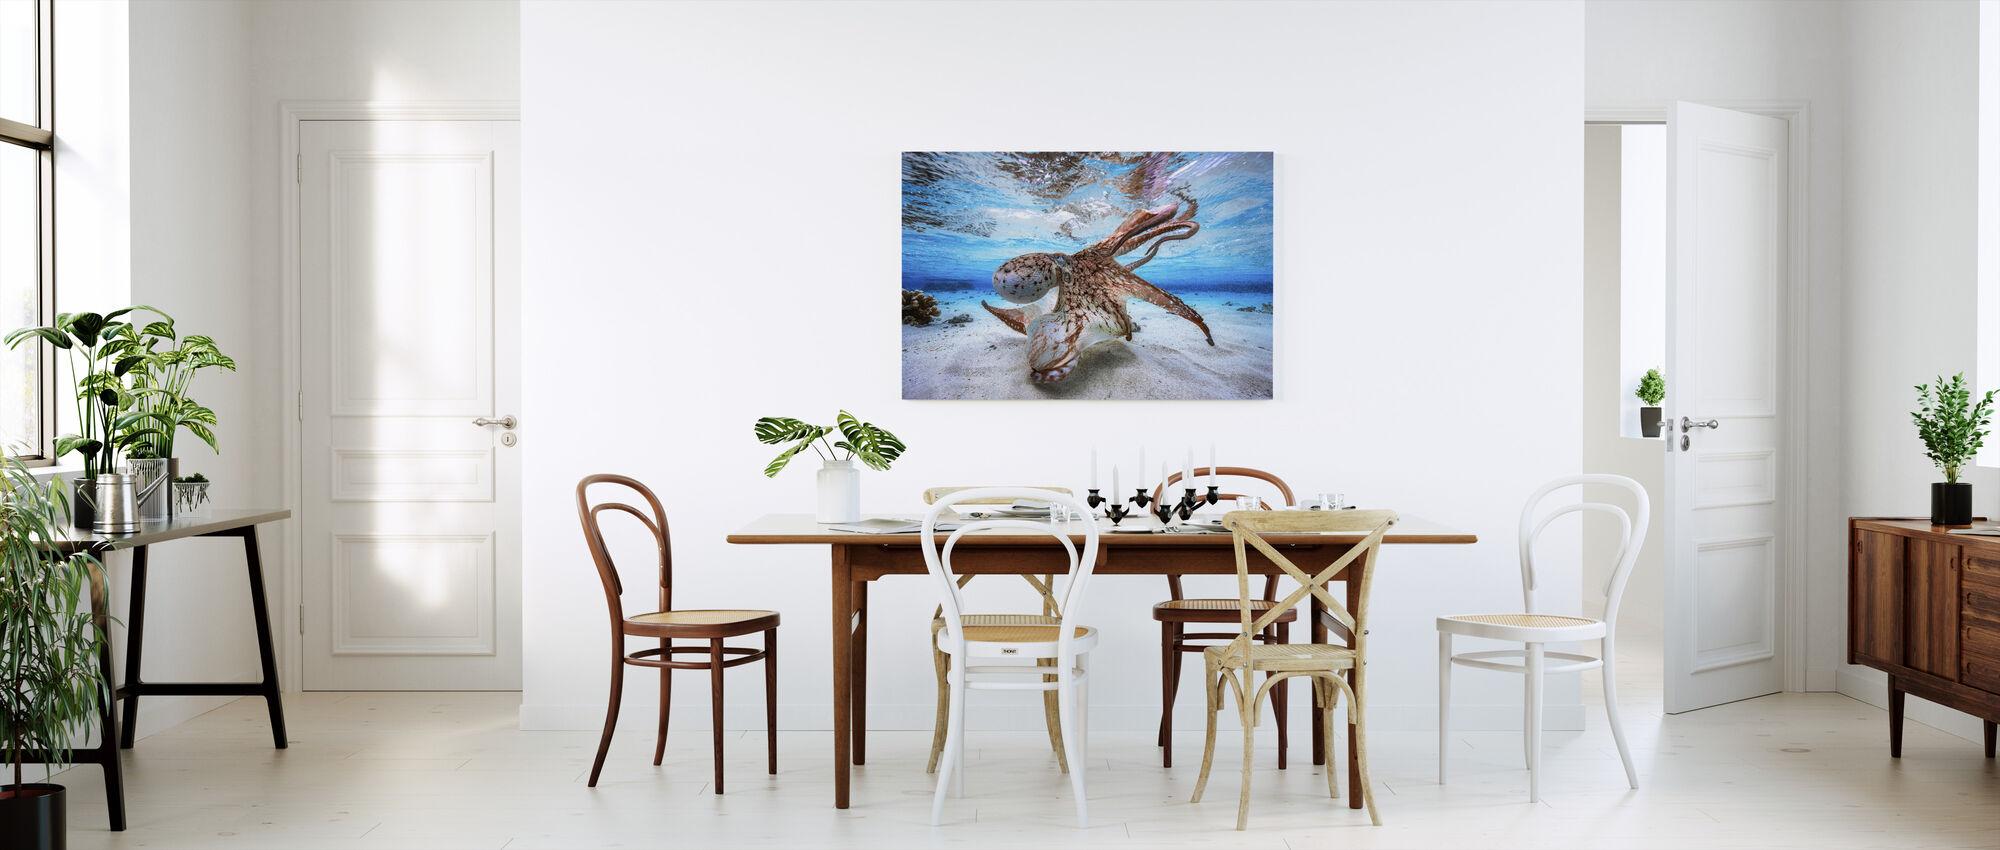 Dancing Octopus - Canvas print - Kitchen